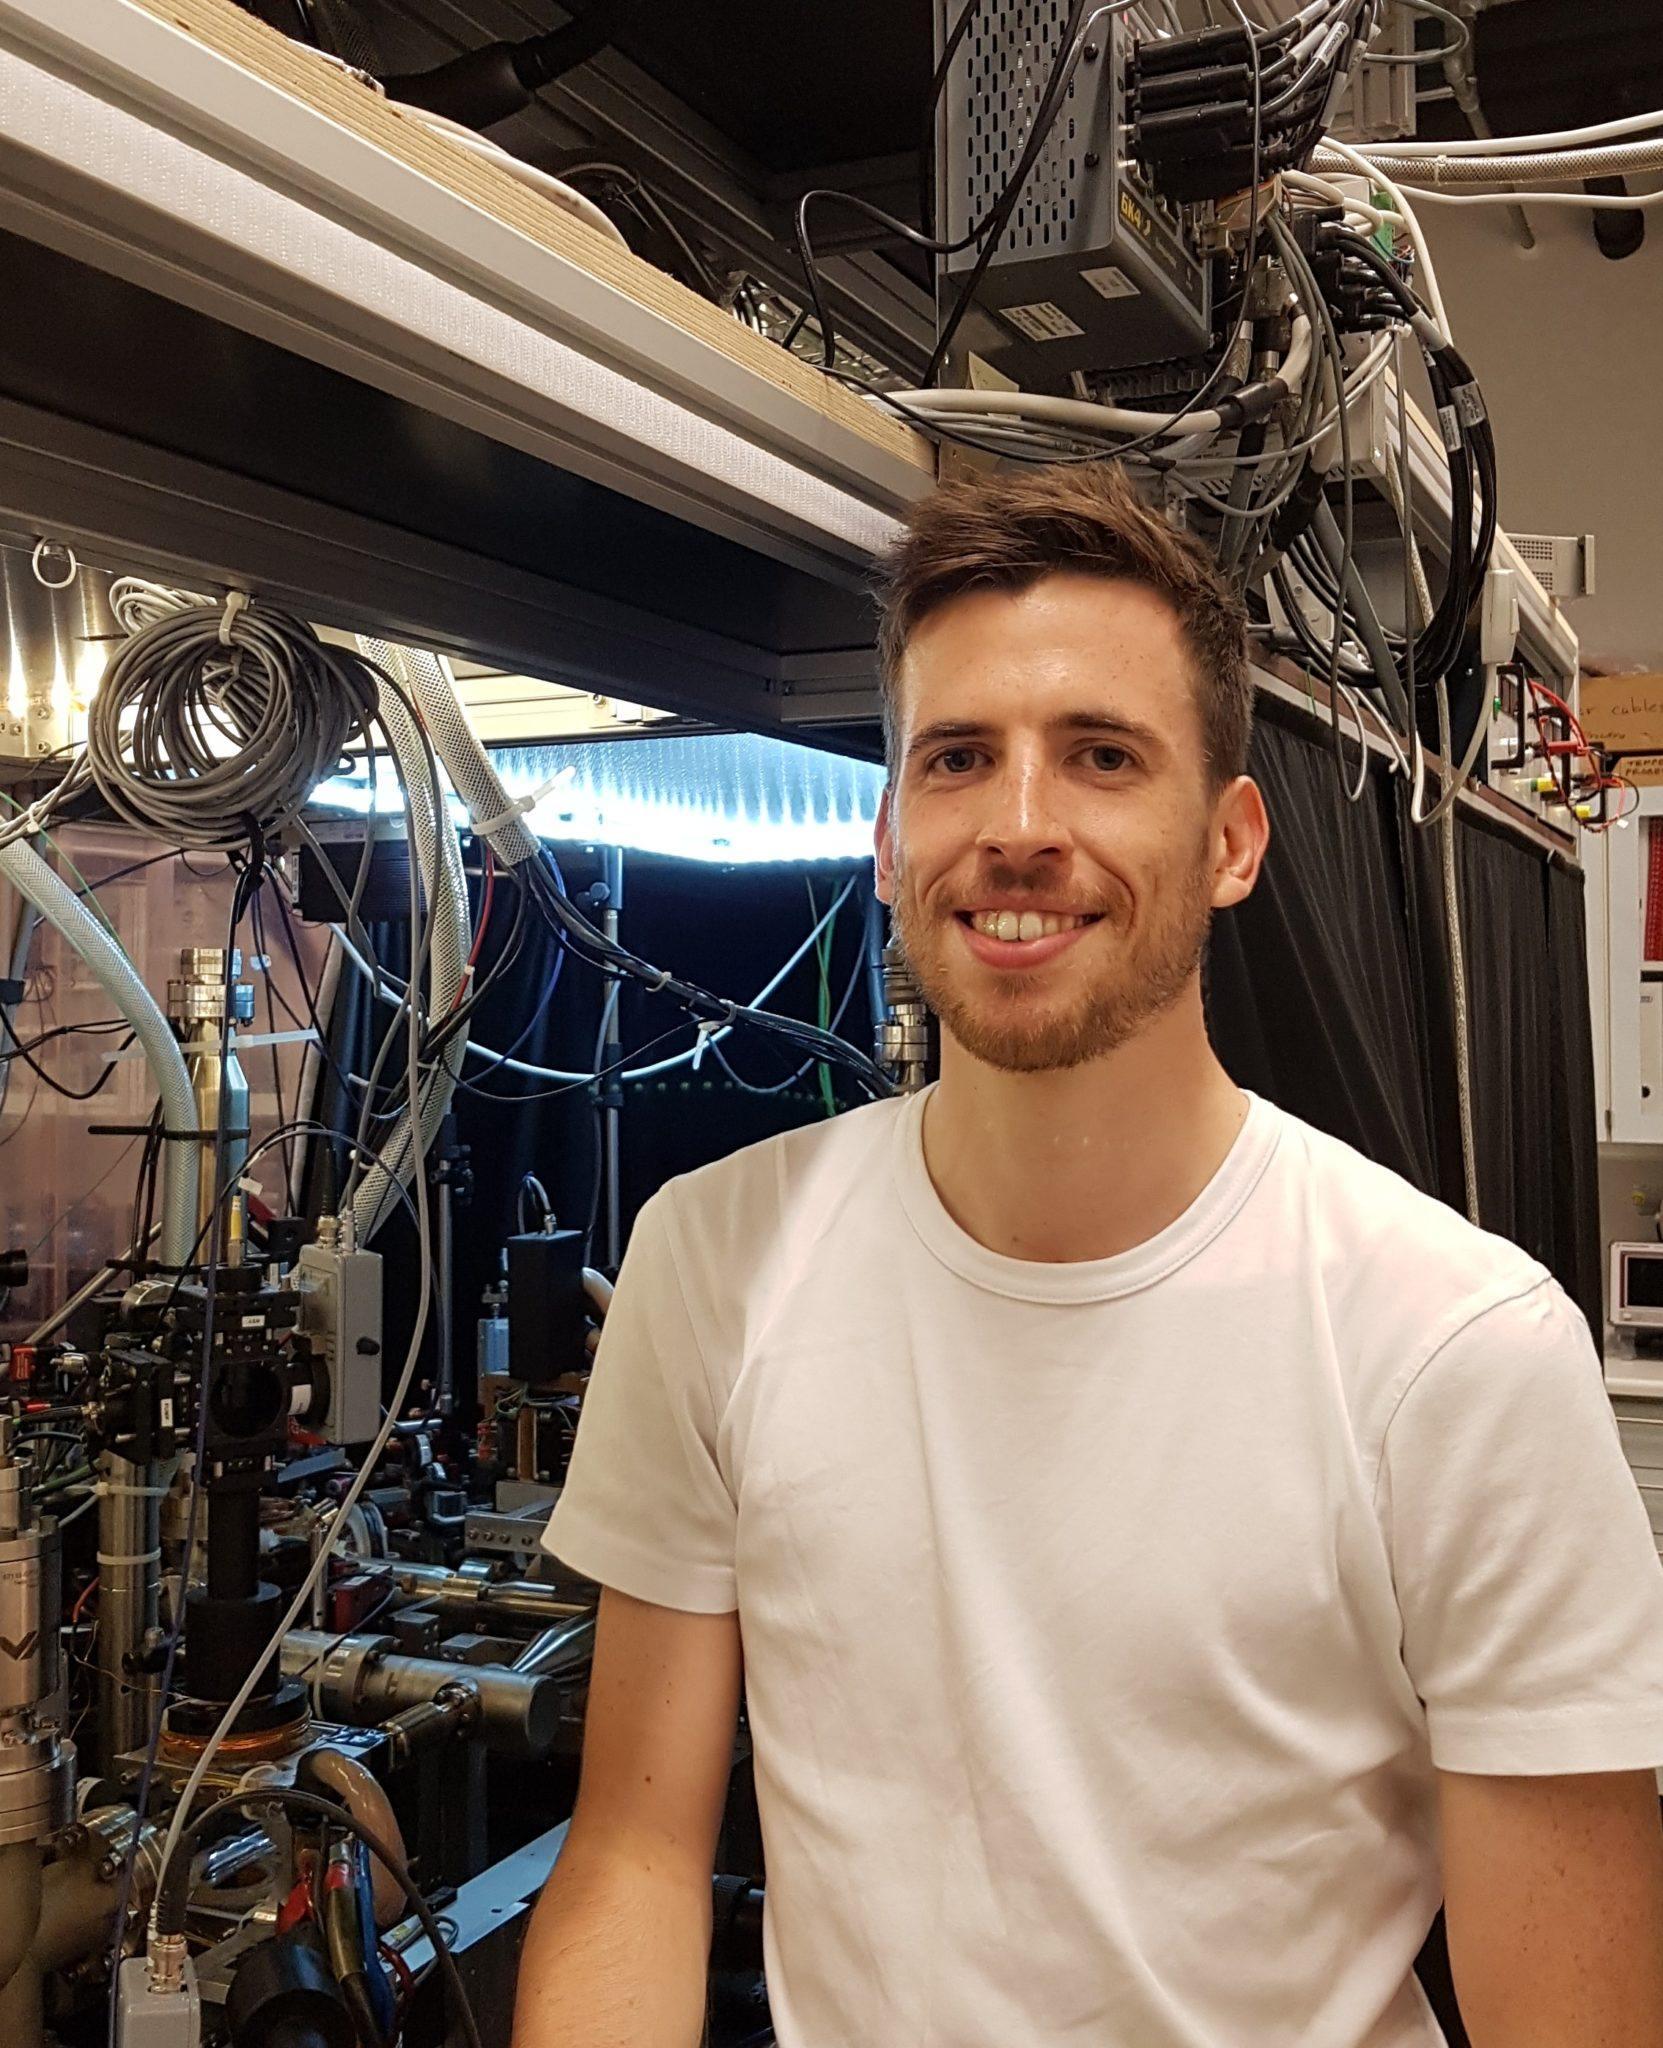 Fysiker på Aarhus Universitet med STX i bagagen